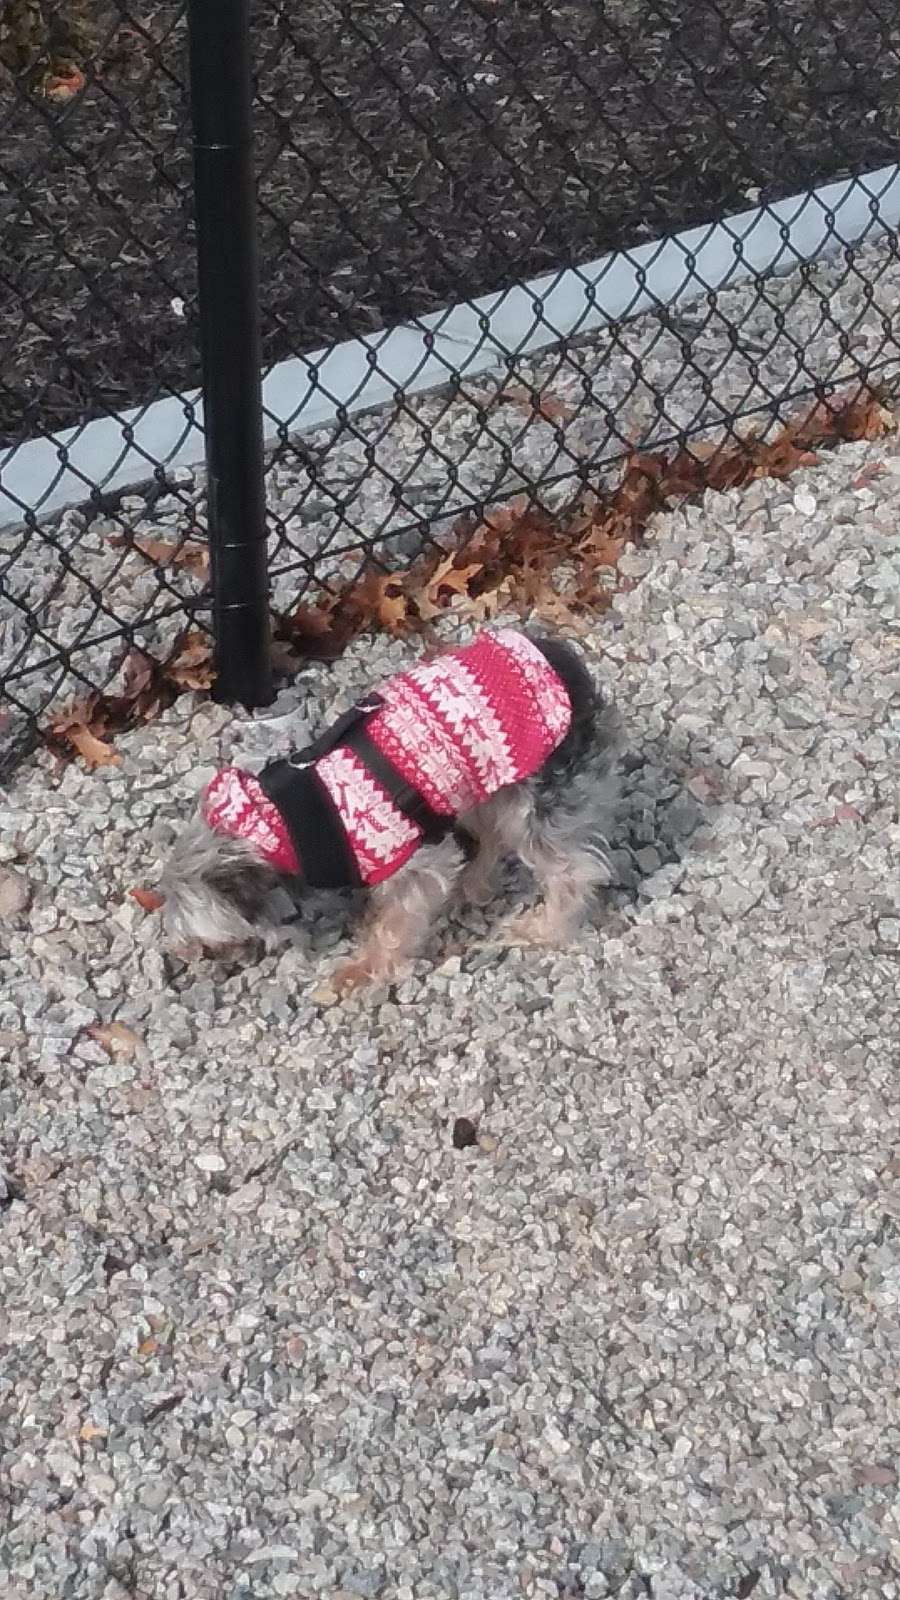 Boneyard Dog Park - park  | Photo 6 of 10 | Address: Kingston, MA 02364, USA